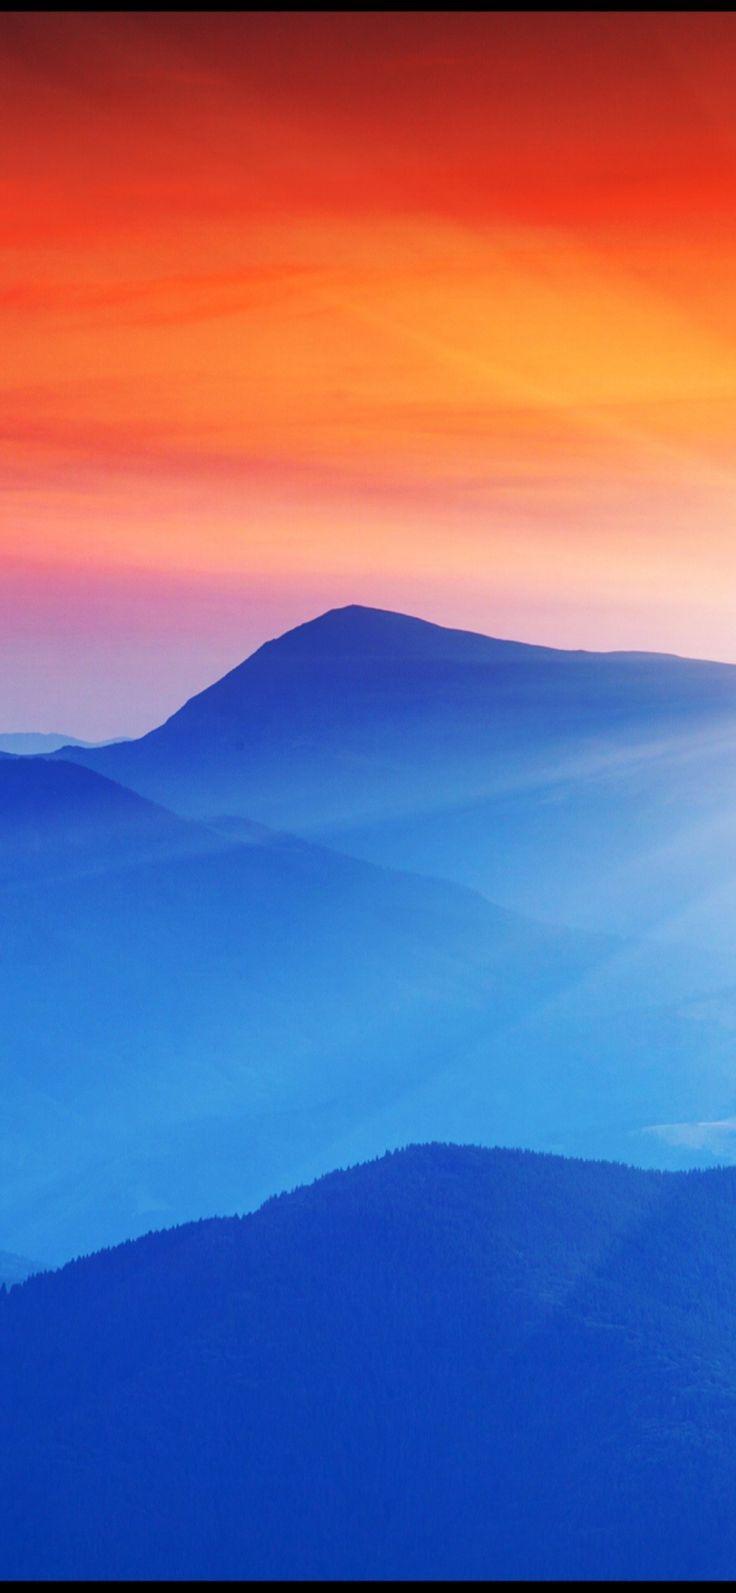 Aesthetic simple organizer / planner desktop wallpaper. Wallpaper Backgrounds Aesthetic - Blue mountain and orange ...